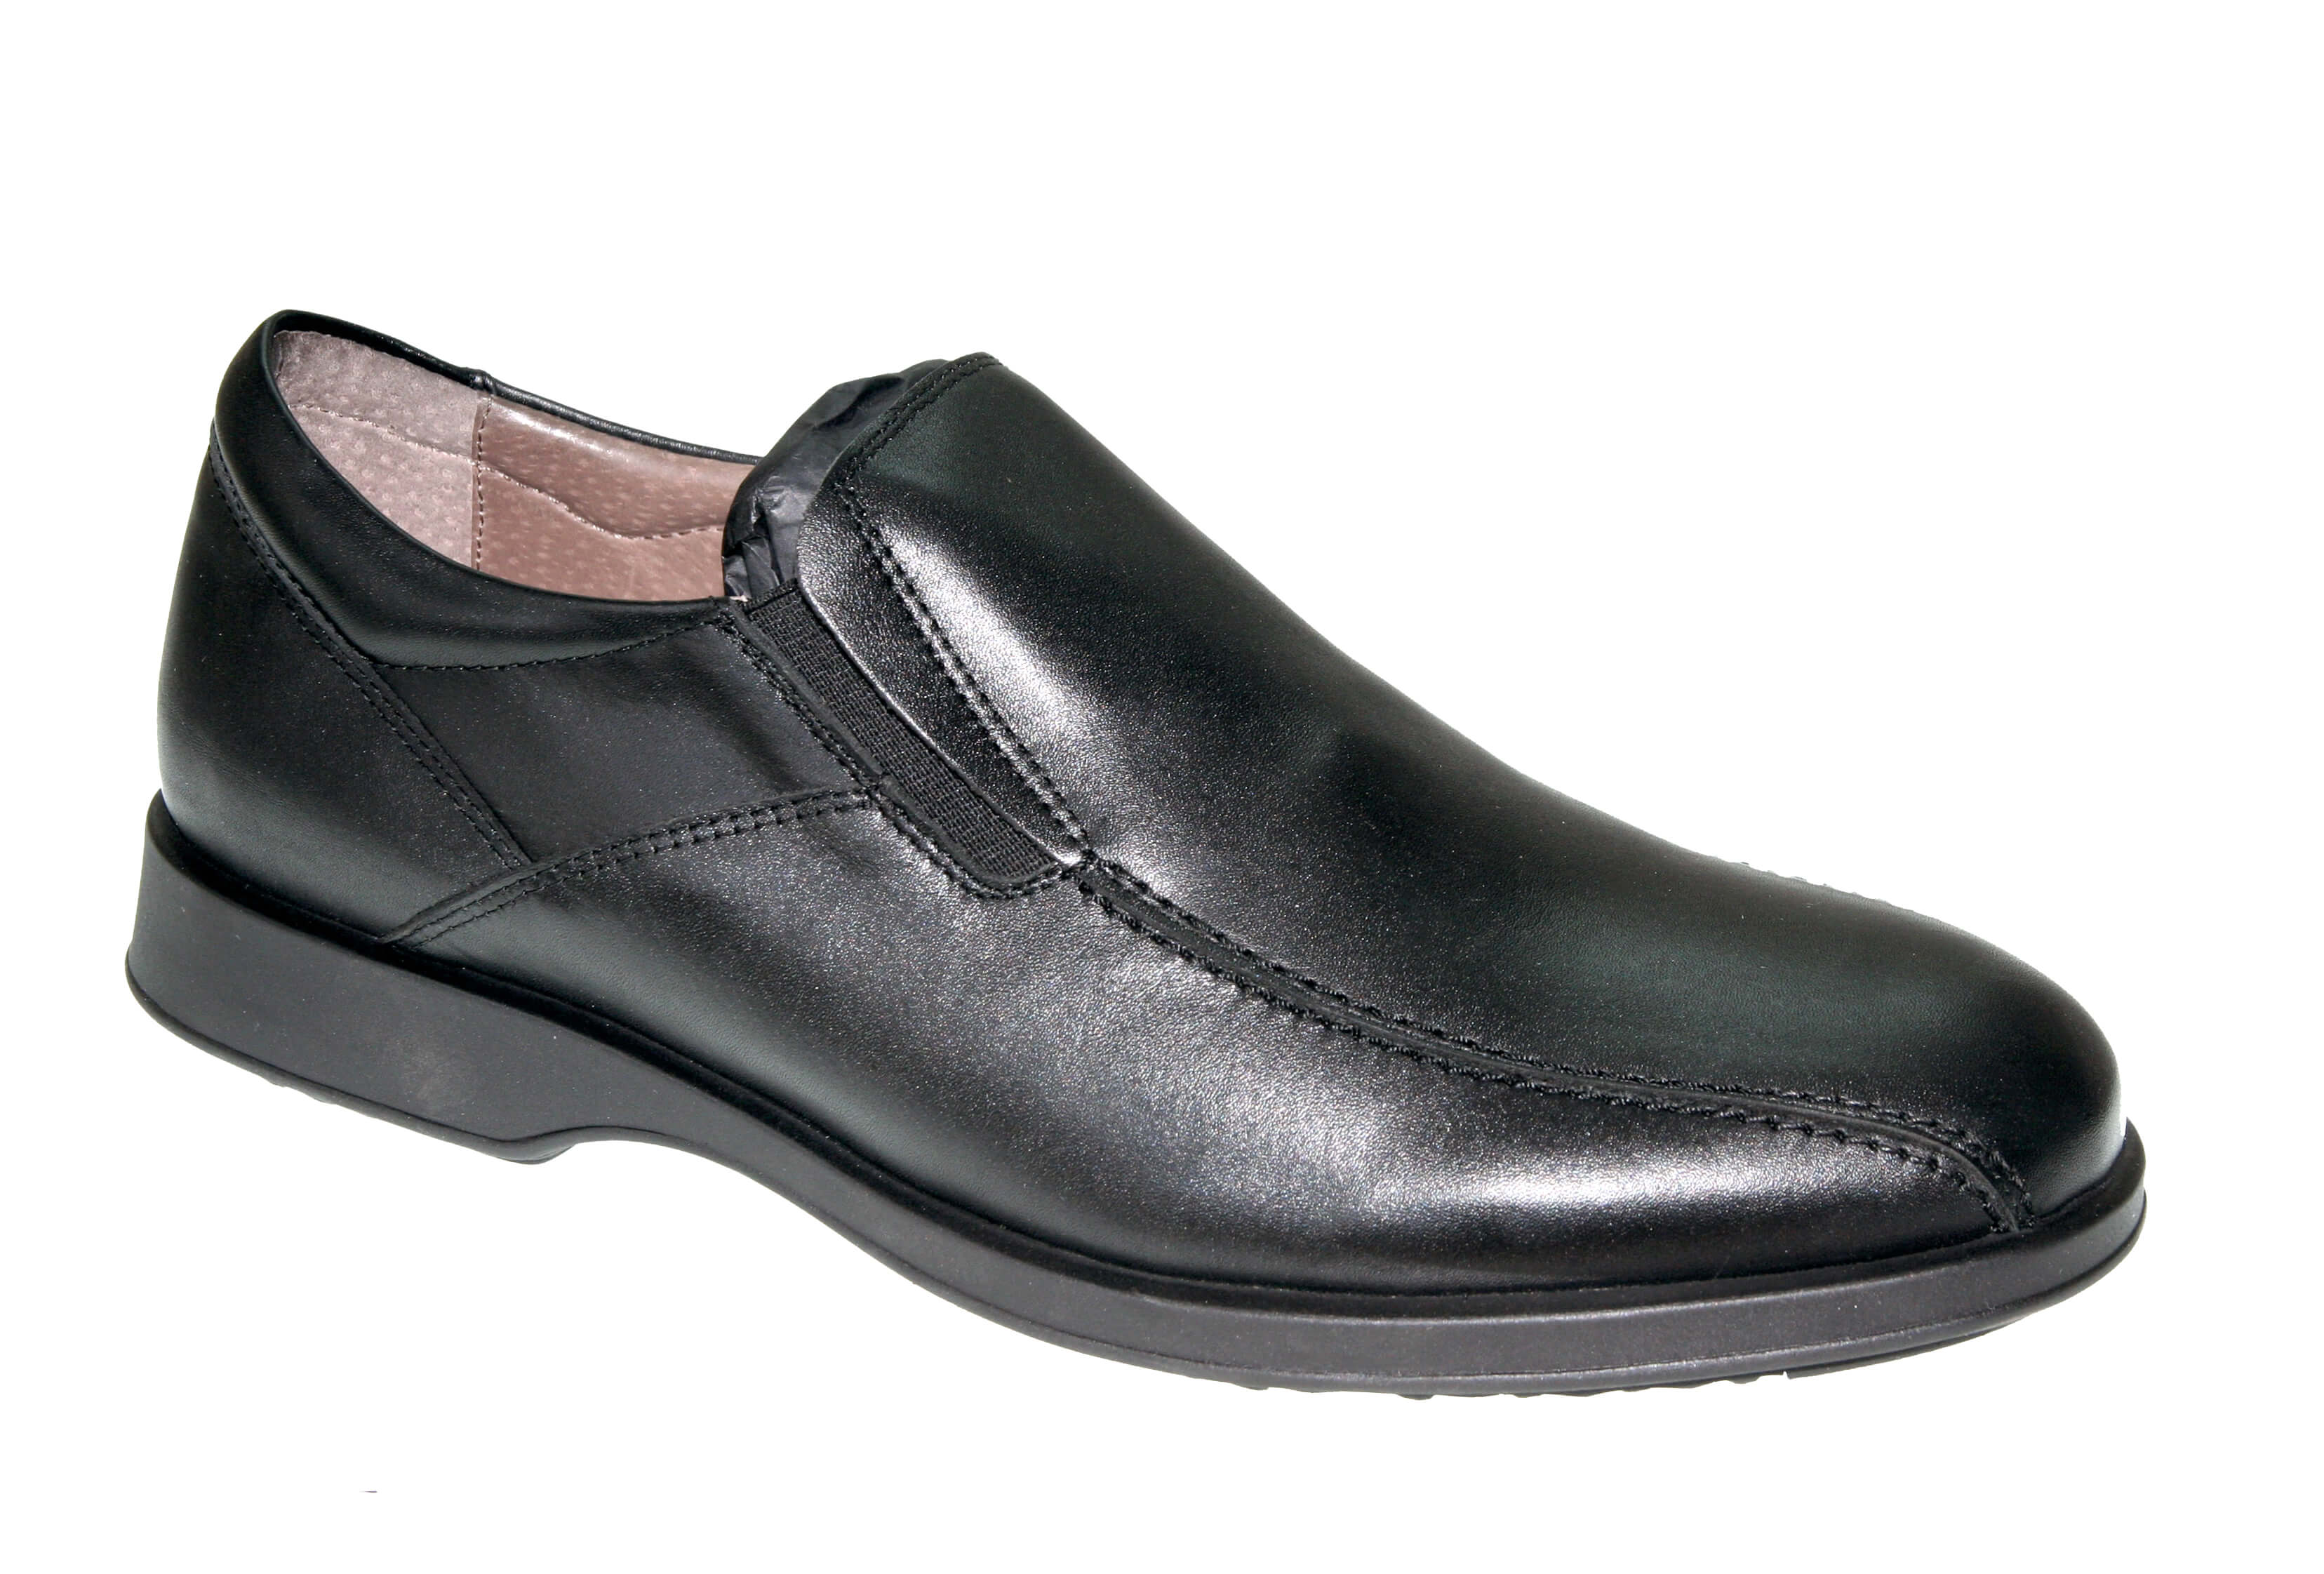 Zapatos anatomicos hombre 7706